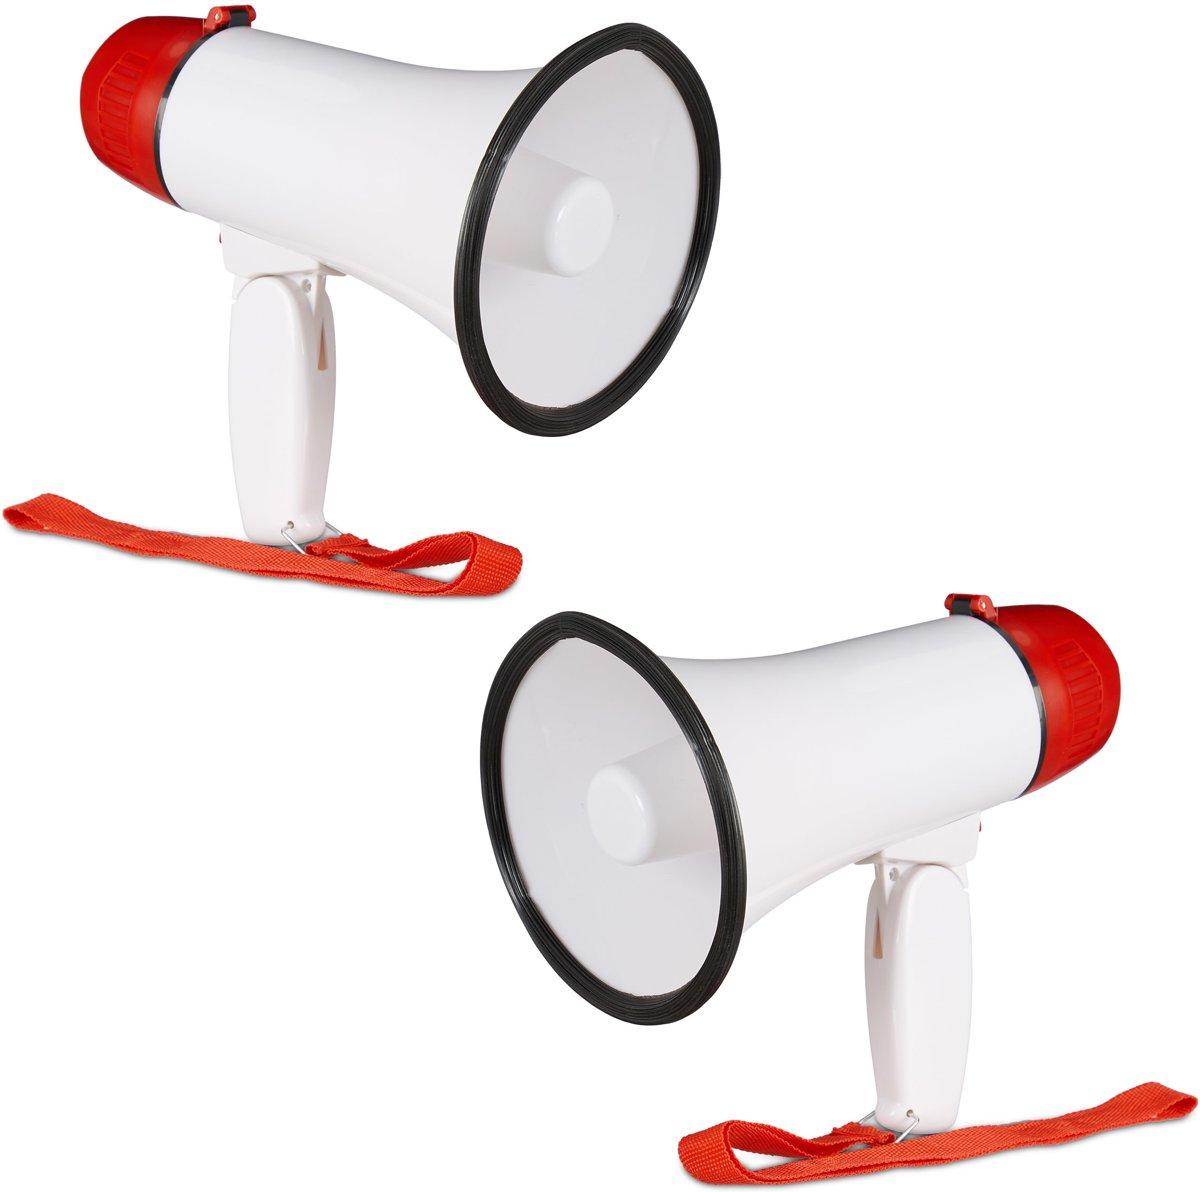 relaxdays 2 x megafoon grappig - megaphone kunststof - wit-rood - stemversterker - 10 watt